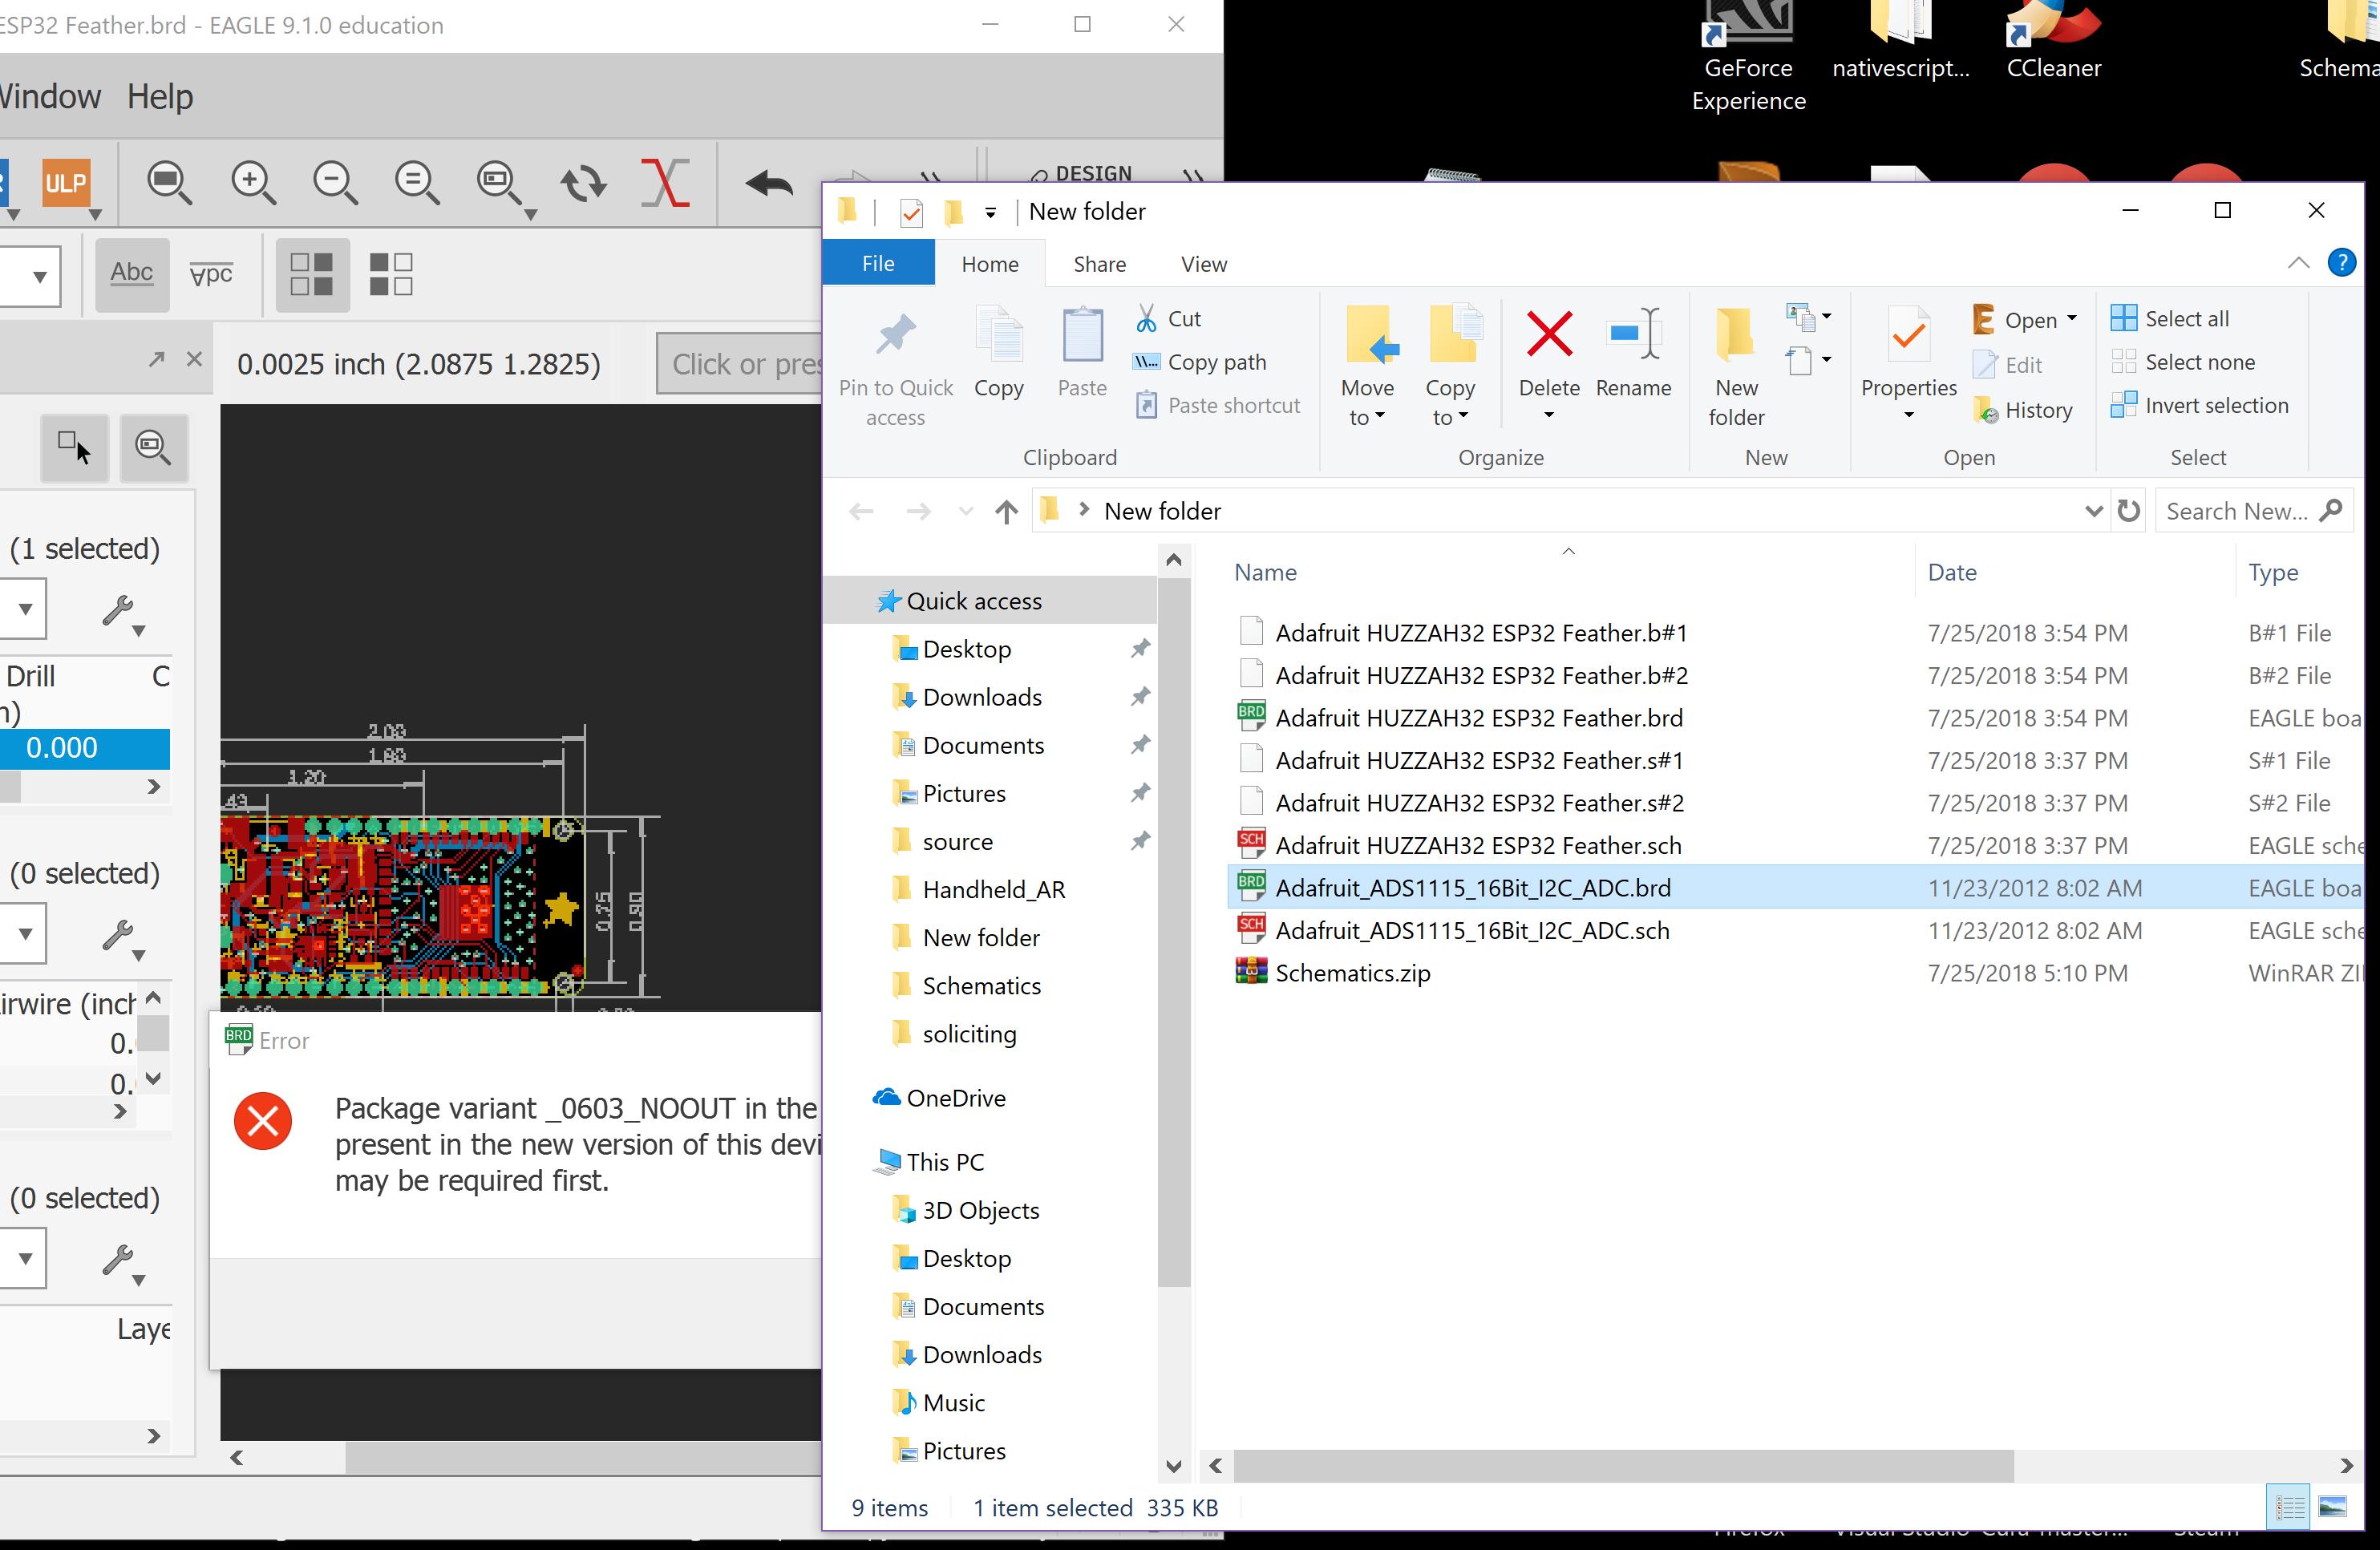 Solved: Please help! Error merging schematics - Autodesk Community